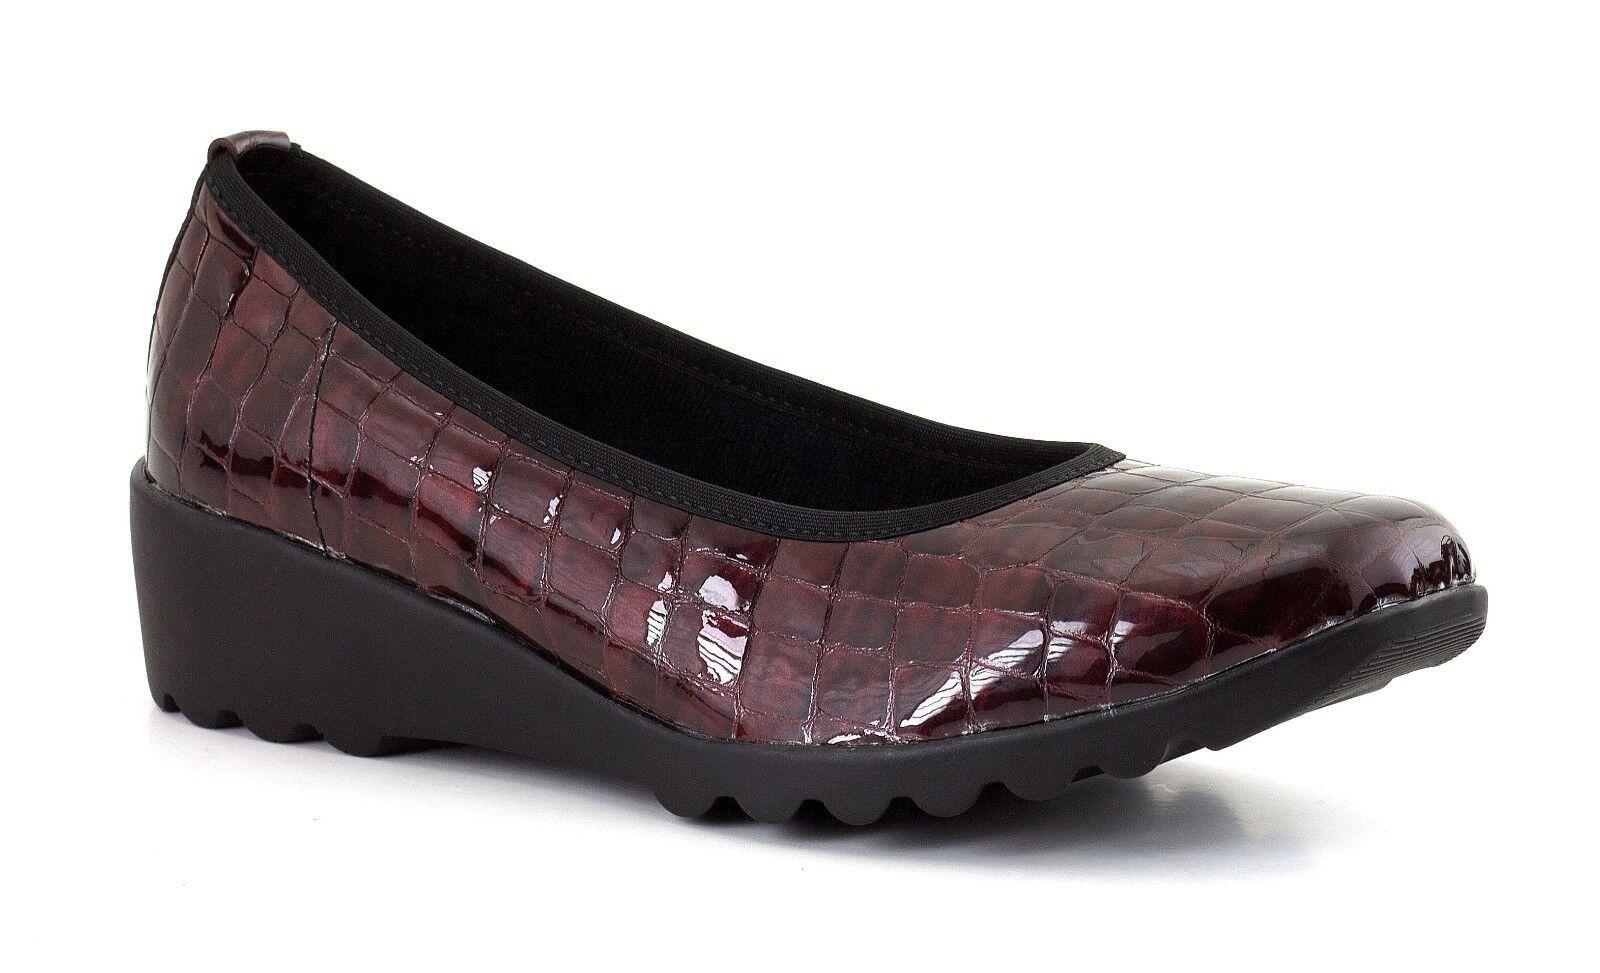 Ladies Bordeaux Wedge Patent shoes Romika Carree UK Size 4, 6, 6.5